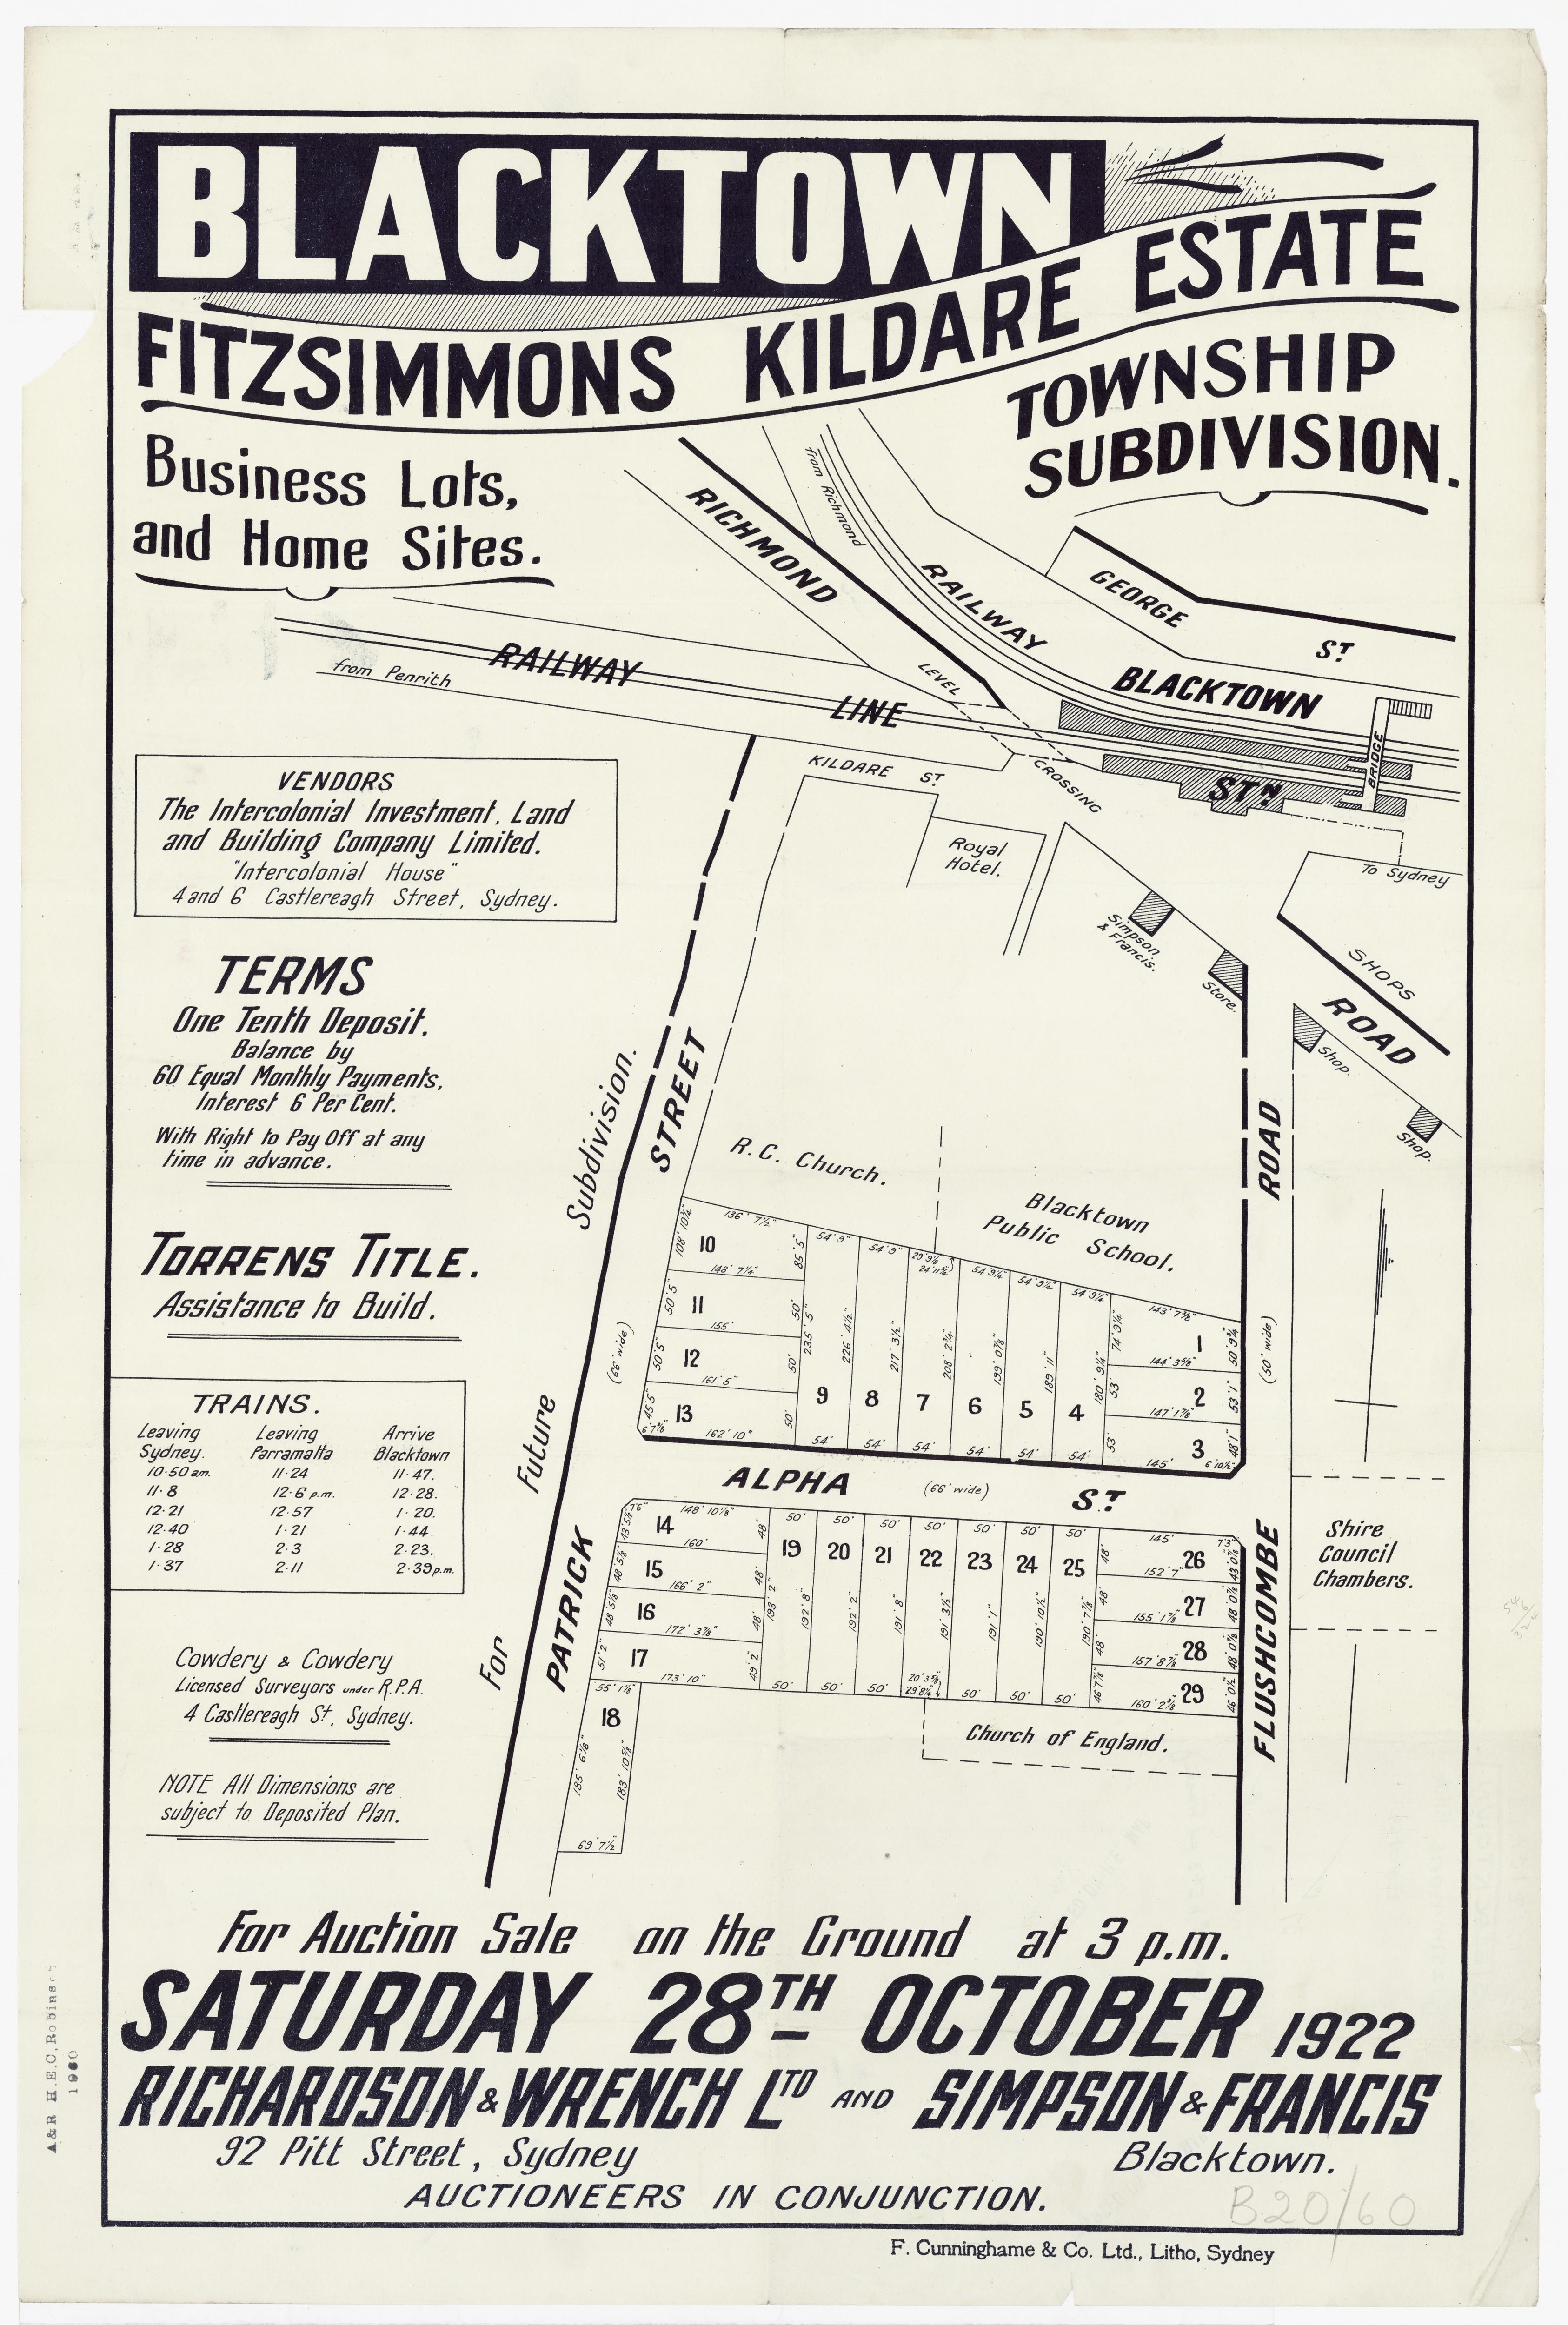 Subdivision Plan: 074 - Z/SP/B20/60 - Blacktown Fitzsimmons Kildare Estate Township subdivision - Patrick St, Flushcombe Rd , 1922